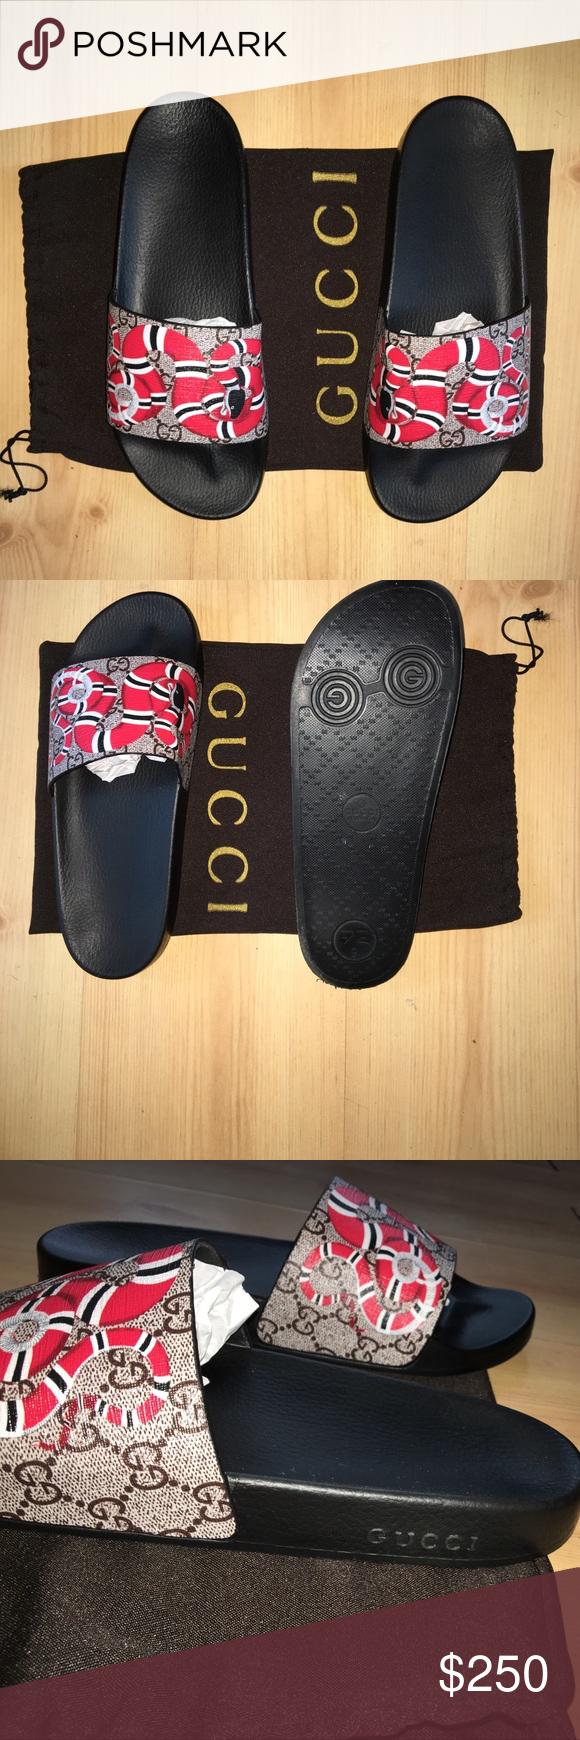 0127180aa26 Gucci GG Snake Slide Sandals Popular Gucci snakes slide sandals size 9  women or men Gucci Shoes Sandals